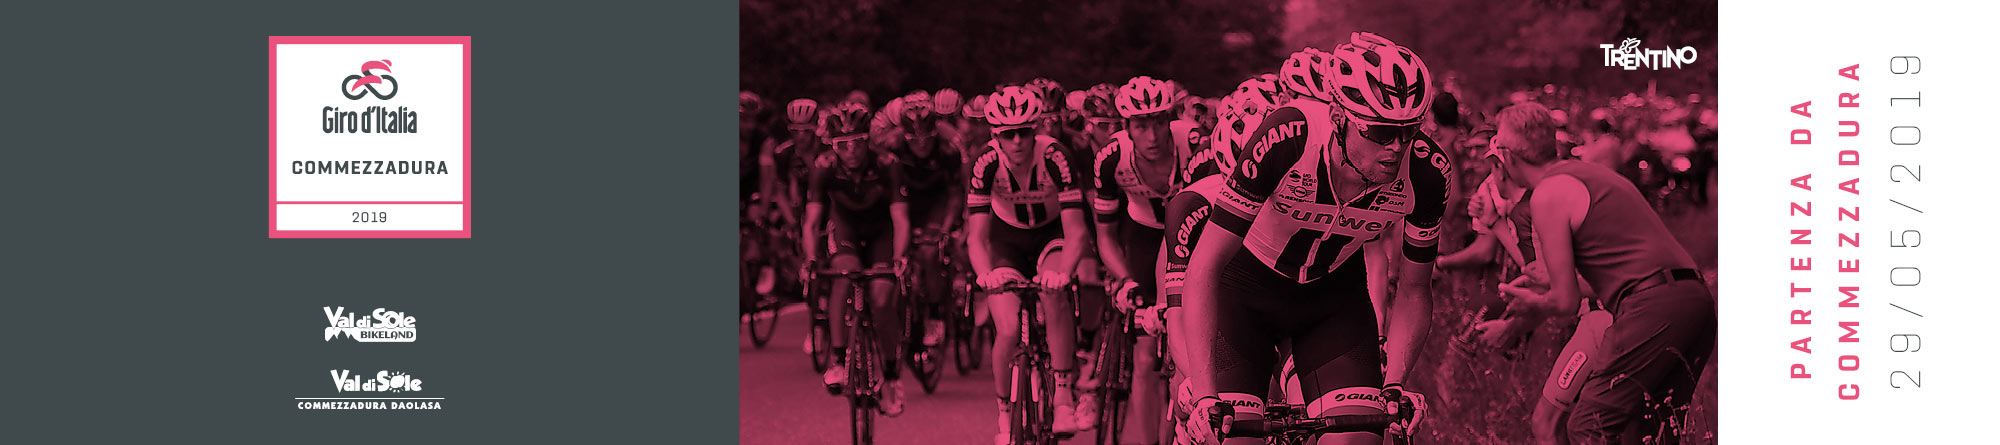 Press releases Giro d'Italia 2019